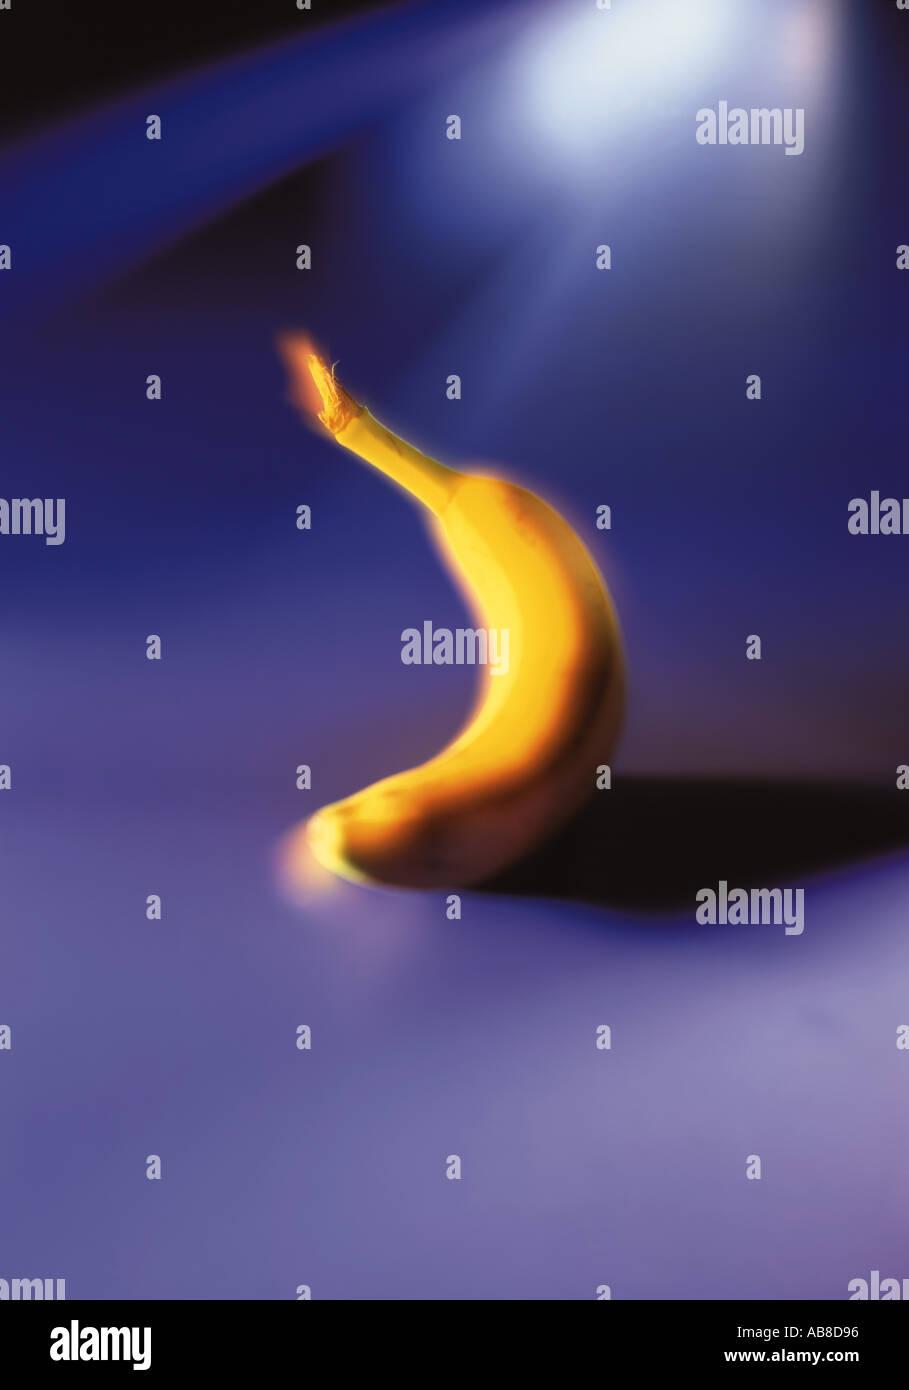 Banana on a blue background - Stock Image